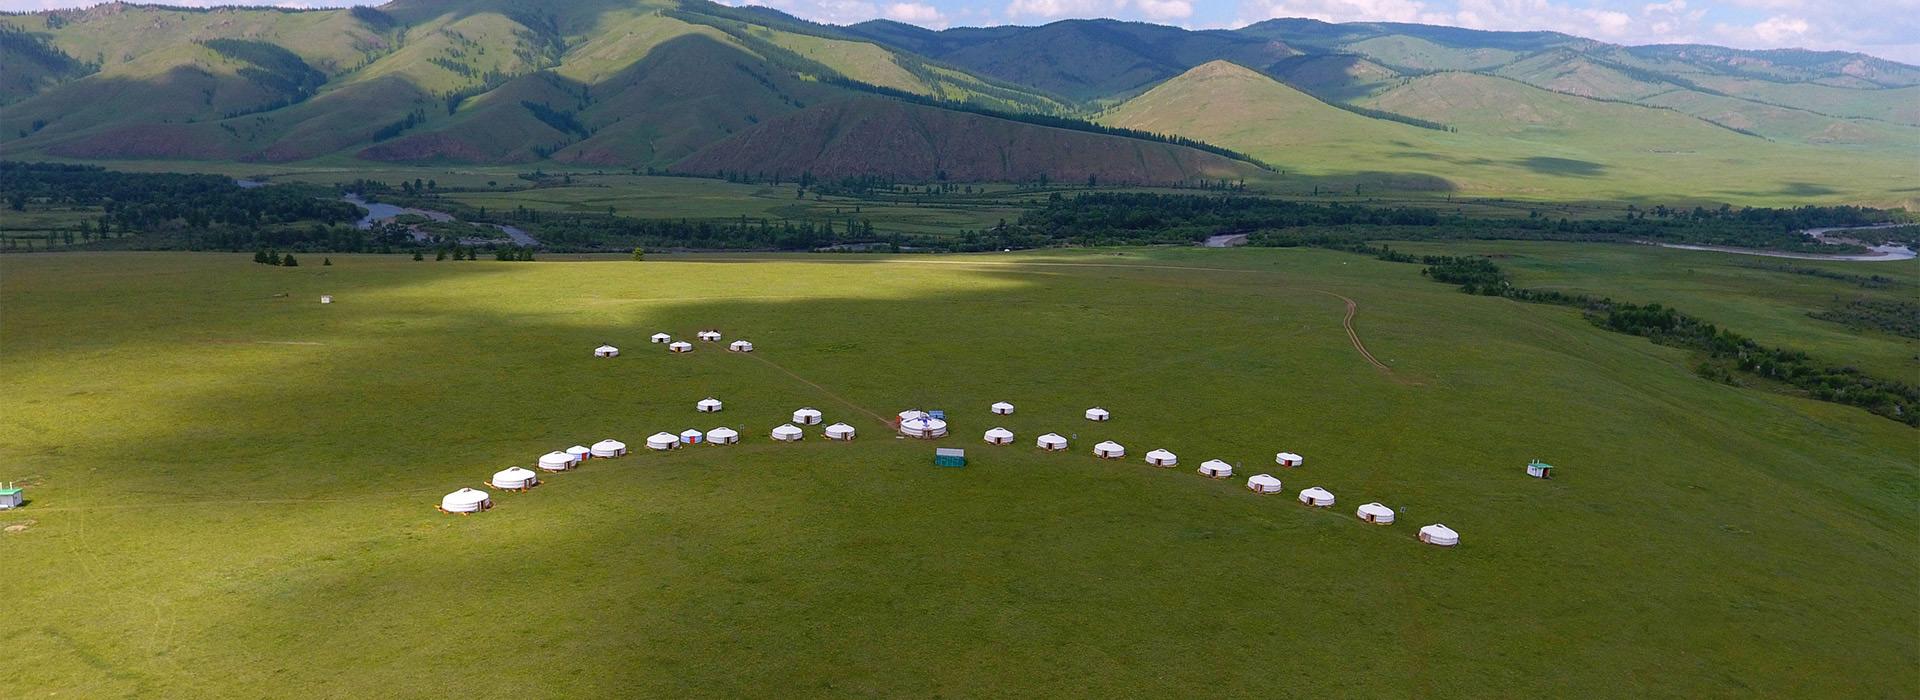 jalman-meadows-wilderness-ger-camp